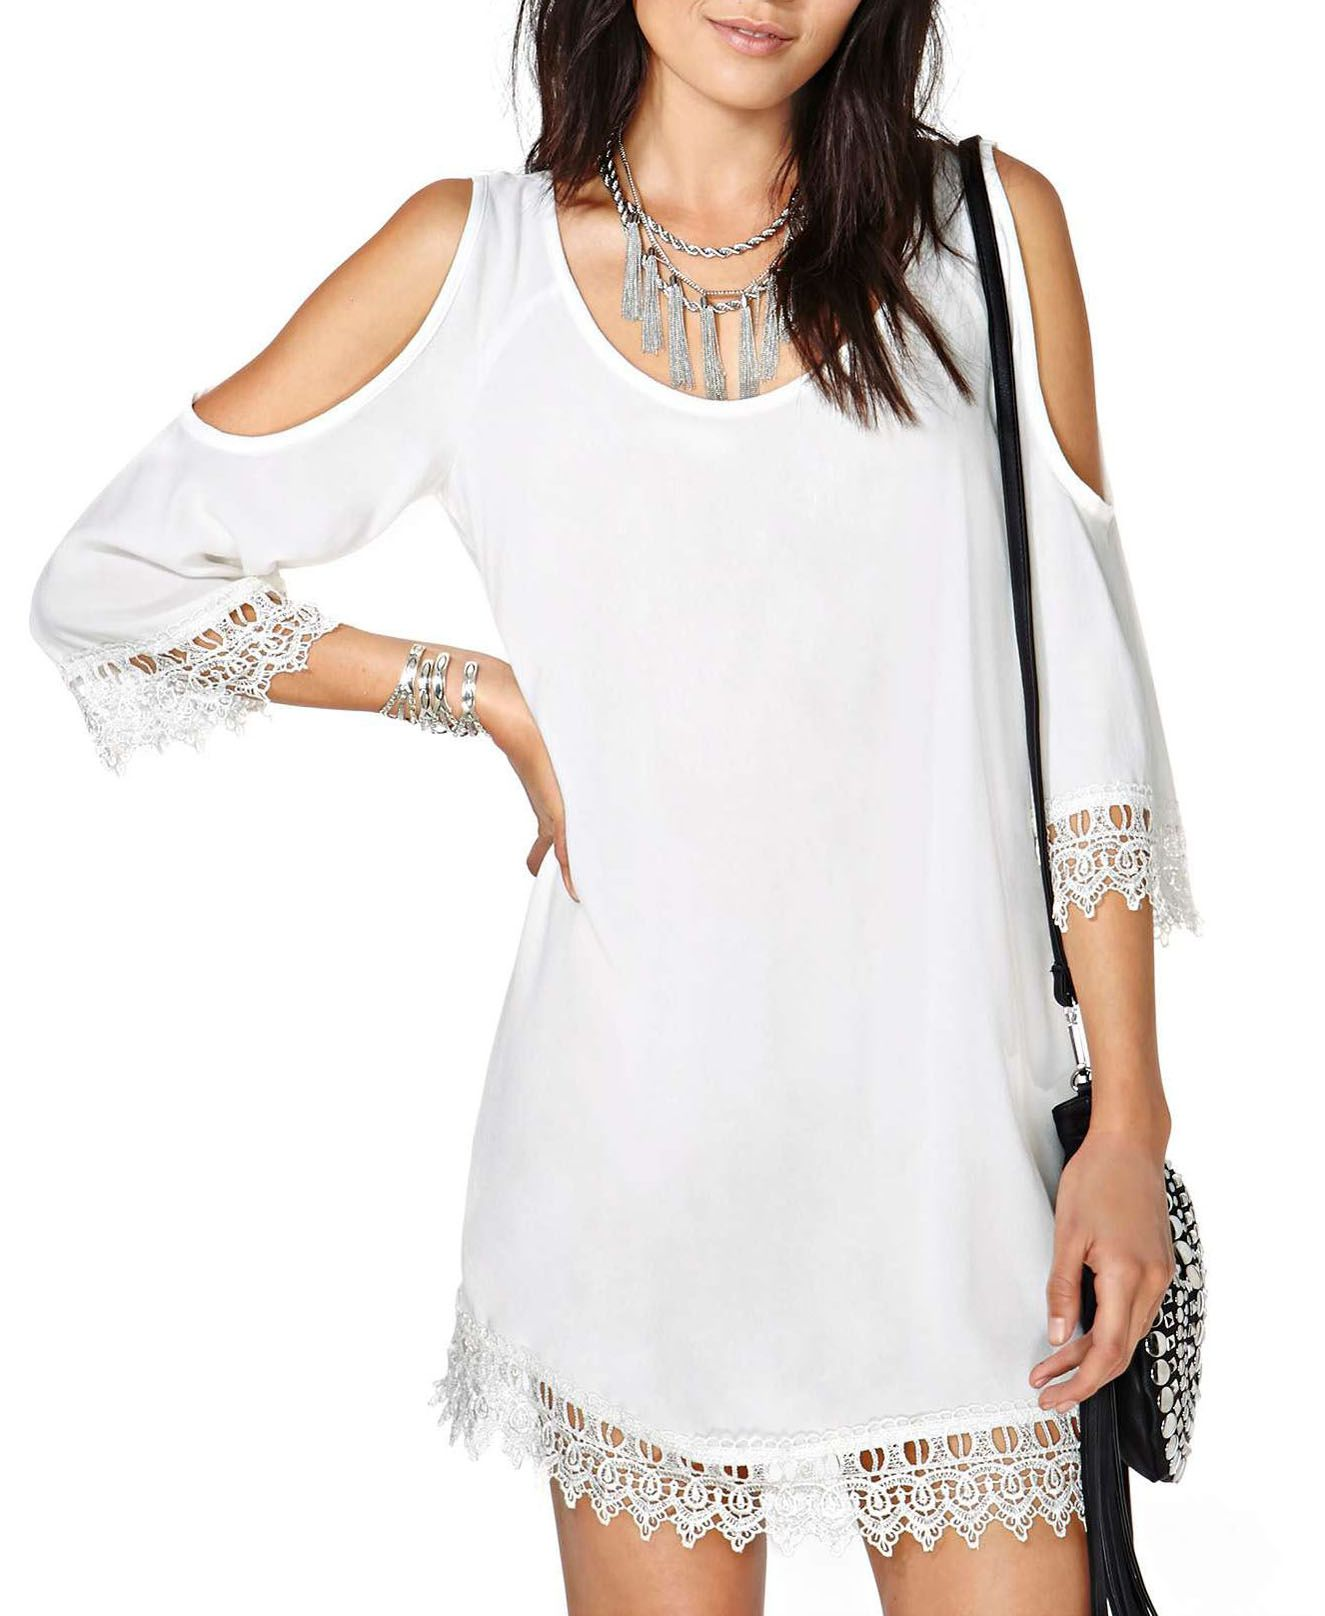 White Off-The-Shoulder Chiffon T-shirt from chicnova